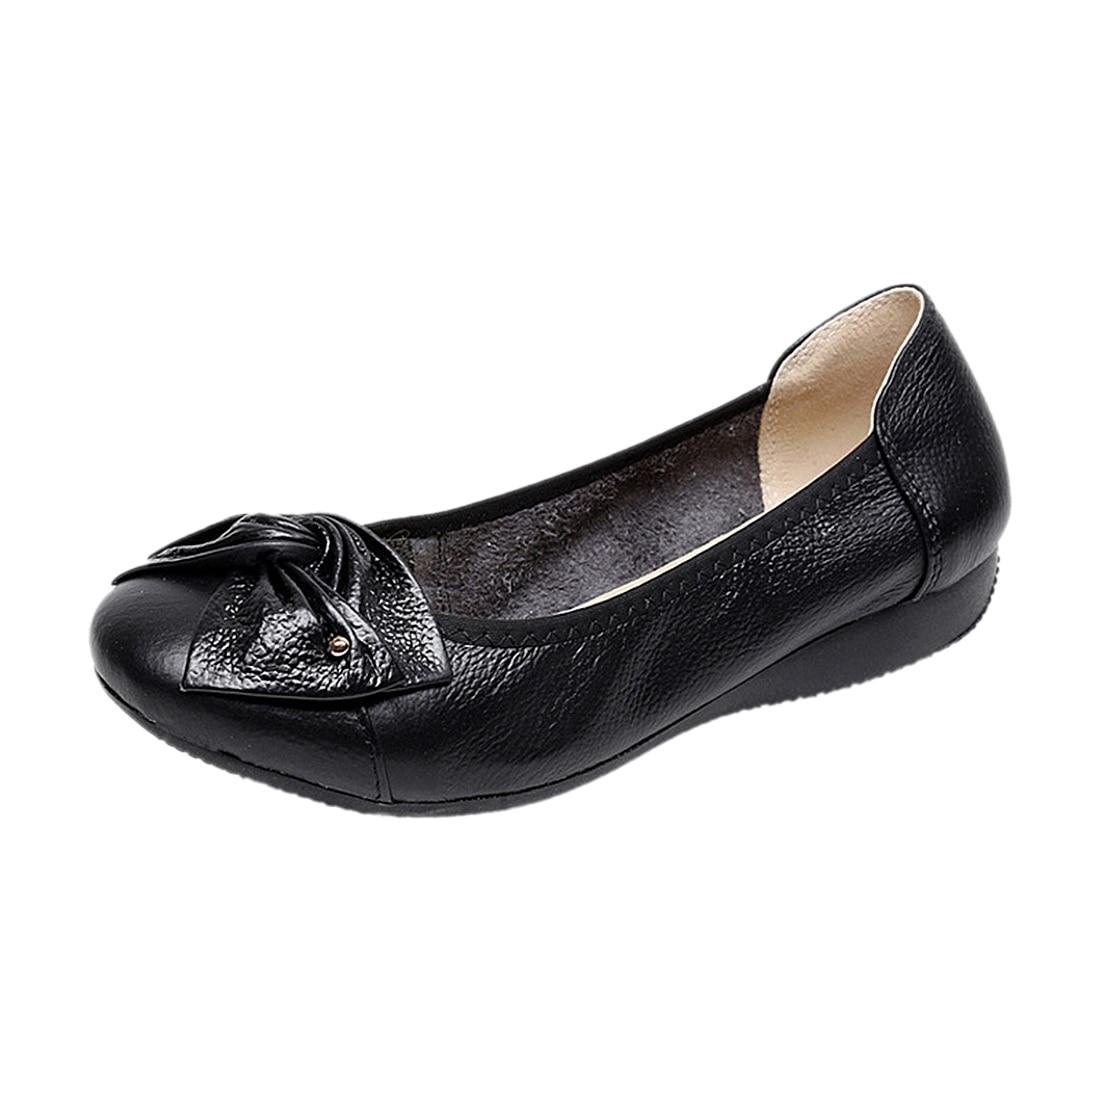 Handmade genuine leather ballet women female casual shoes women flats shoes slip on car-styling driving loafer women shoes handmade genuine leather